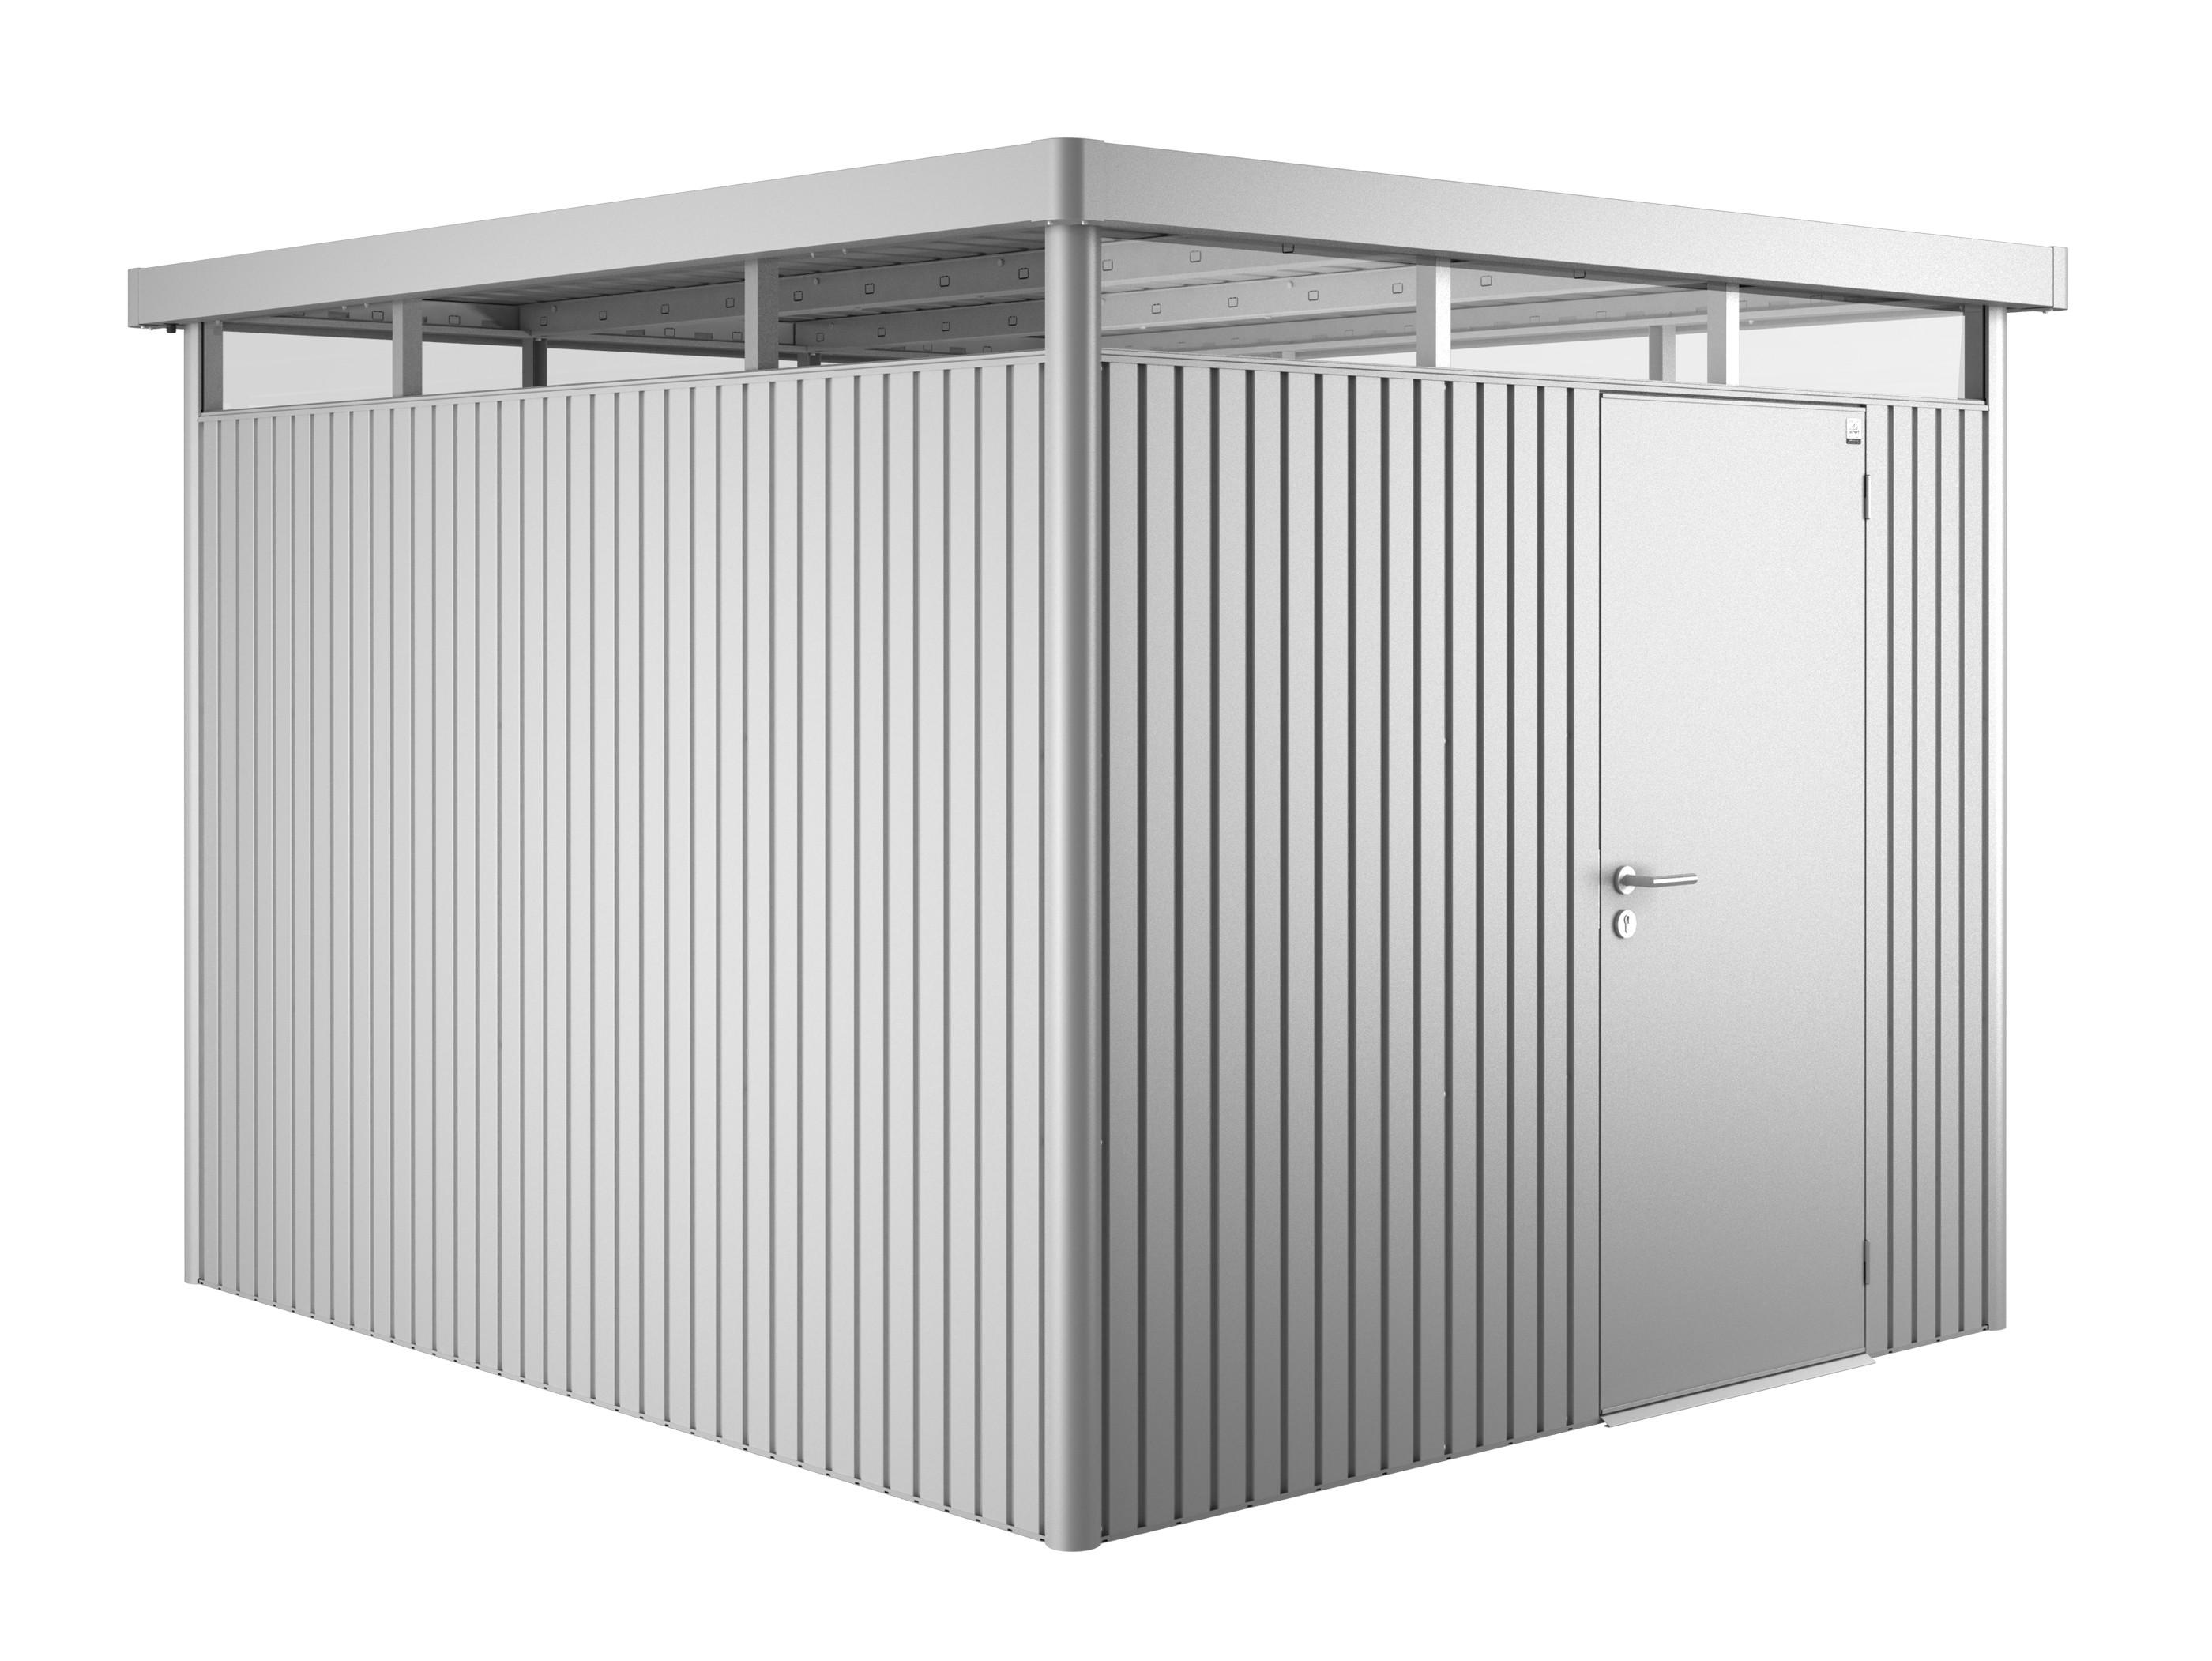 ger tehaus biohort highline h5 silber metallic 275x315x222cm bei. Black Bedroom Furniture Sets. Home Design Ideas